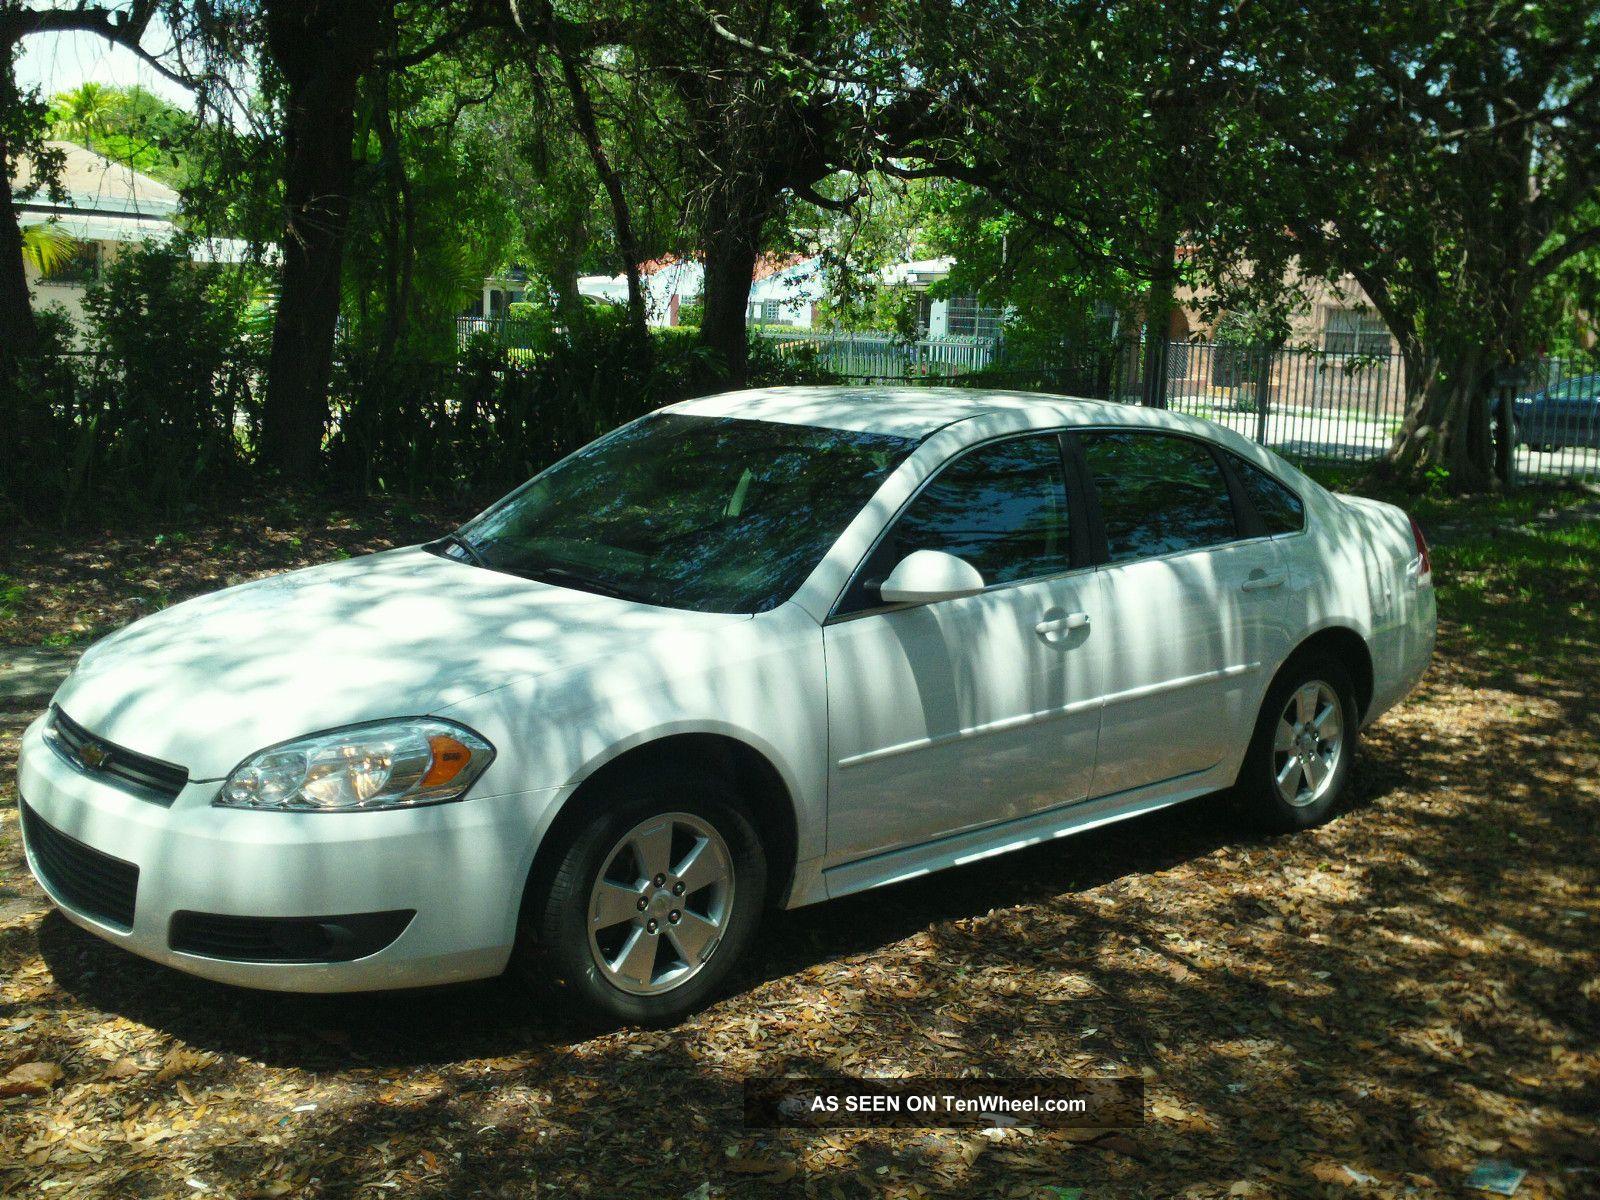 2010 chevrolet impala lt sedan 4 door 3 5l. Cars Review. Best American Auto & Cars Review